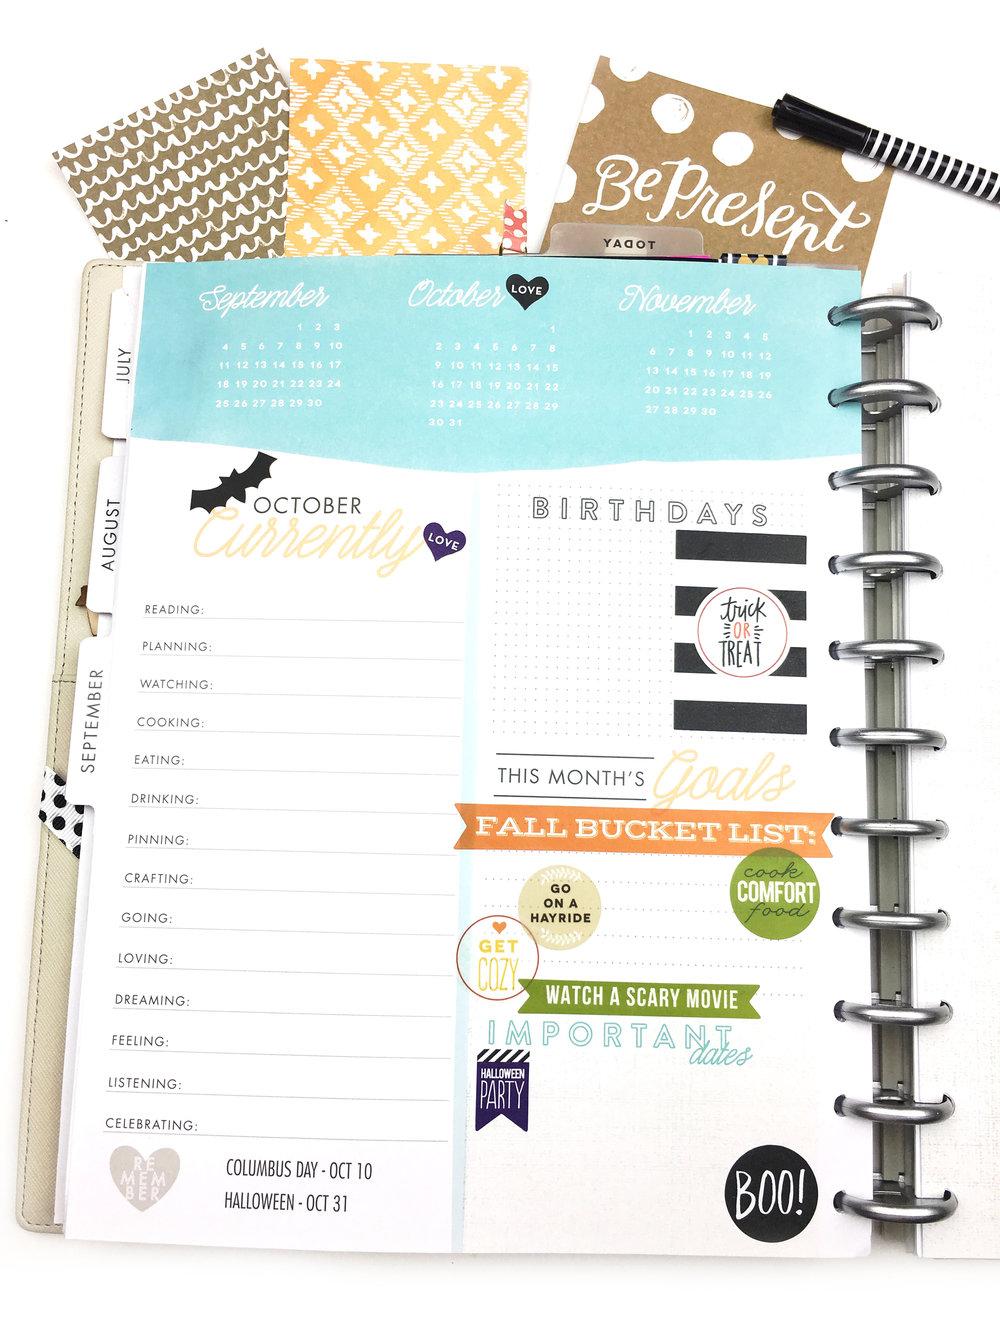 October prep #beforethepen in the 'Stay Golden' BIG Happy Planner™ ob mambi Design Team member Chantal Stevens | me & my BIG ideas